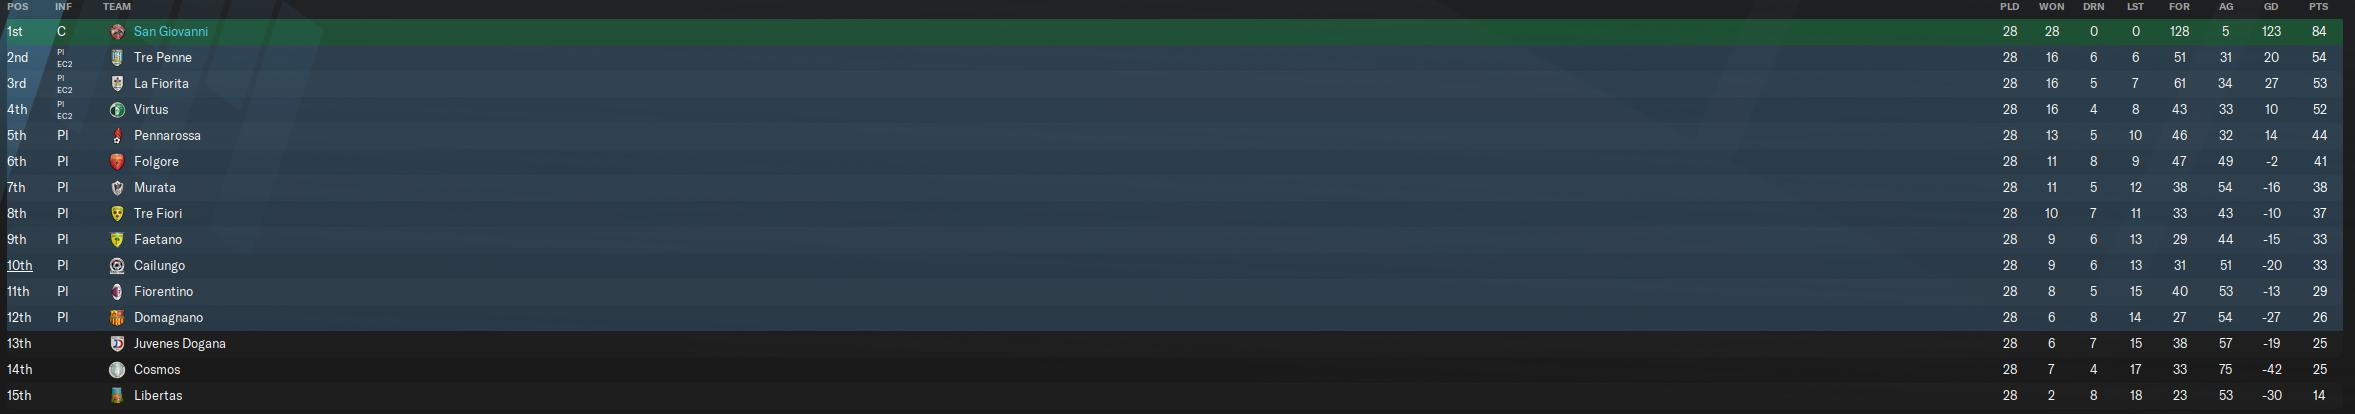 32-33 league table.PNG